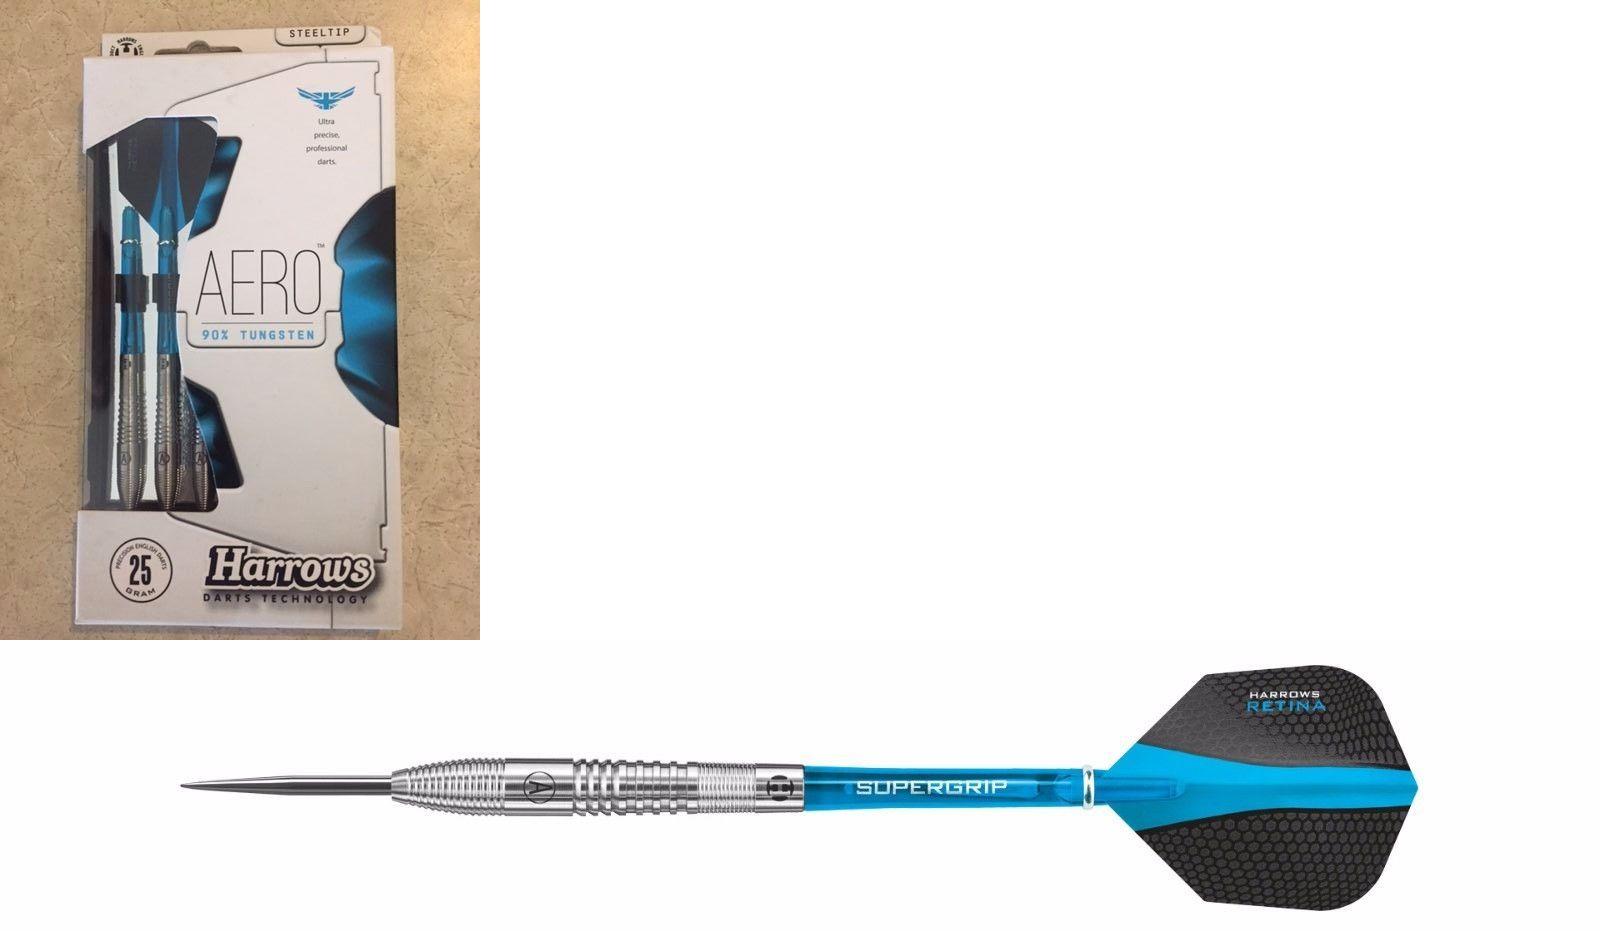 Darts-Steel Tips 26332: Harrows Aero 25G 90% Tungsten Steel Tip Darts BUY IT NOW ONLY: $56.61